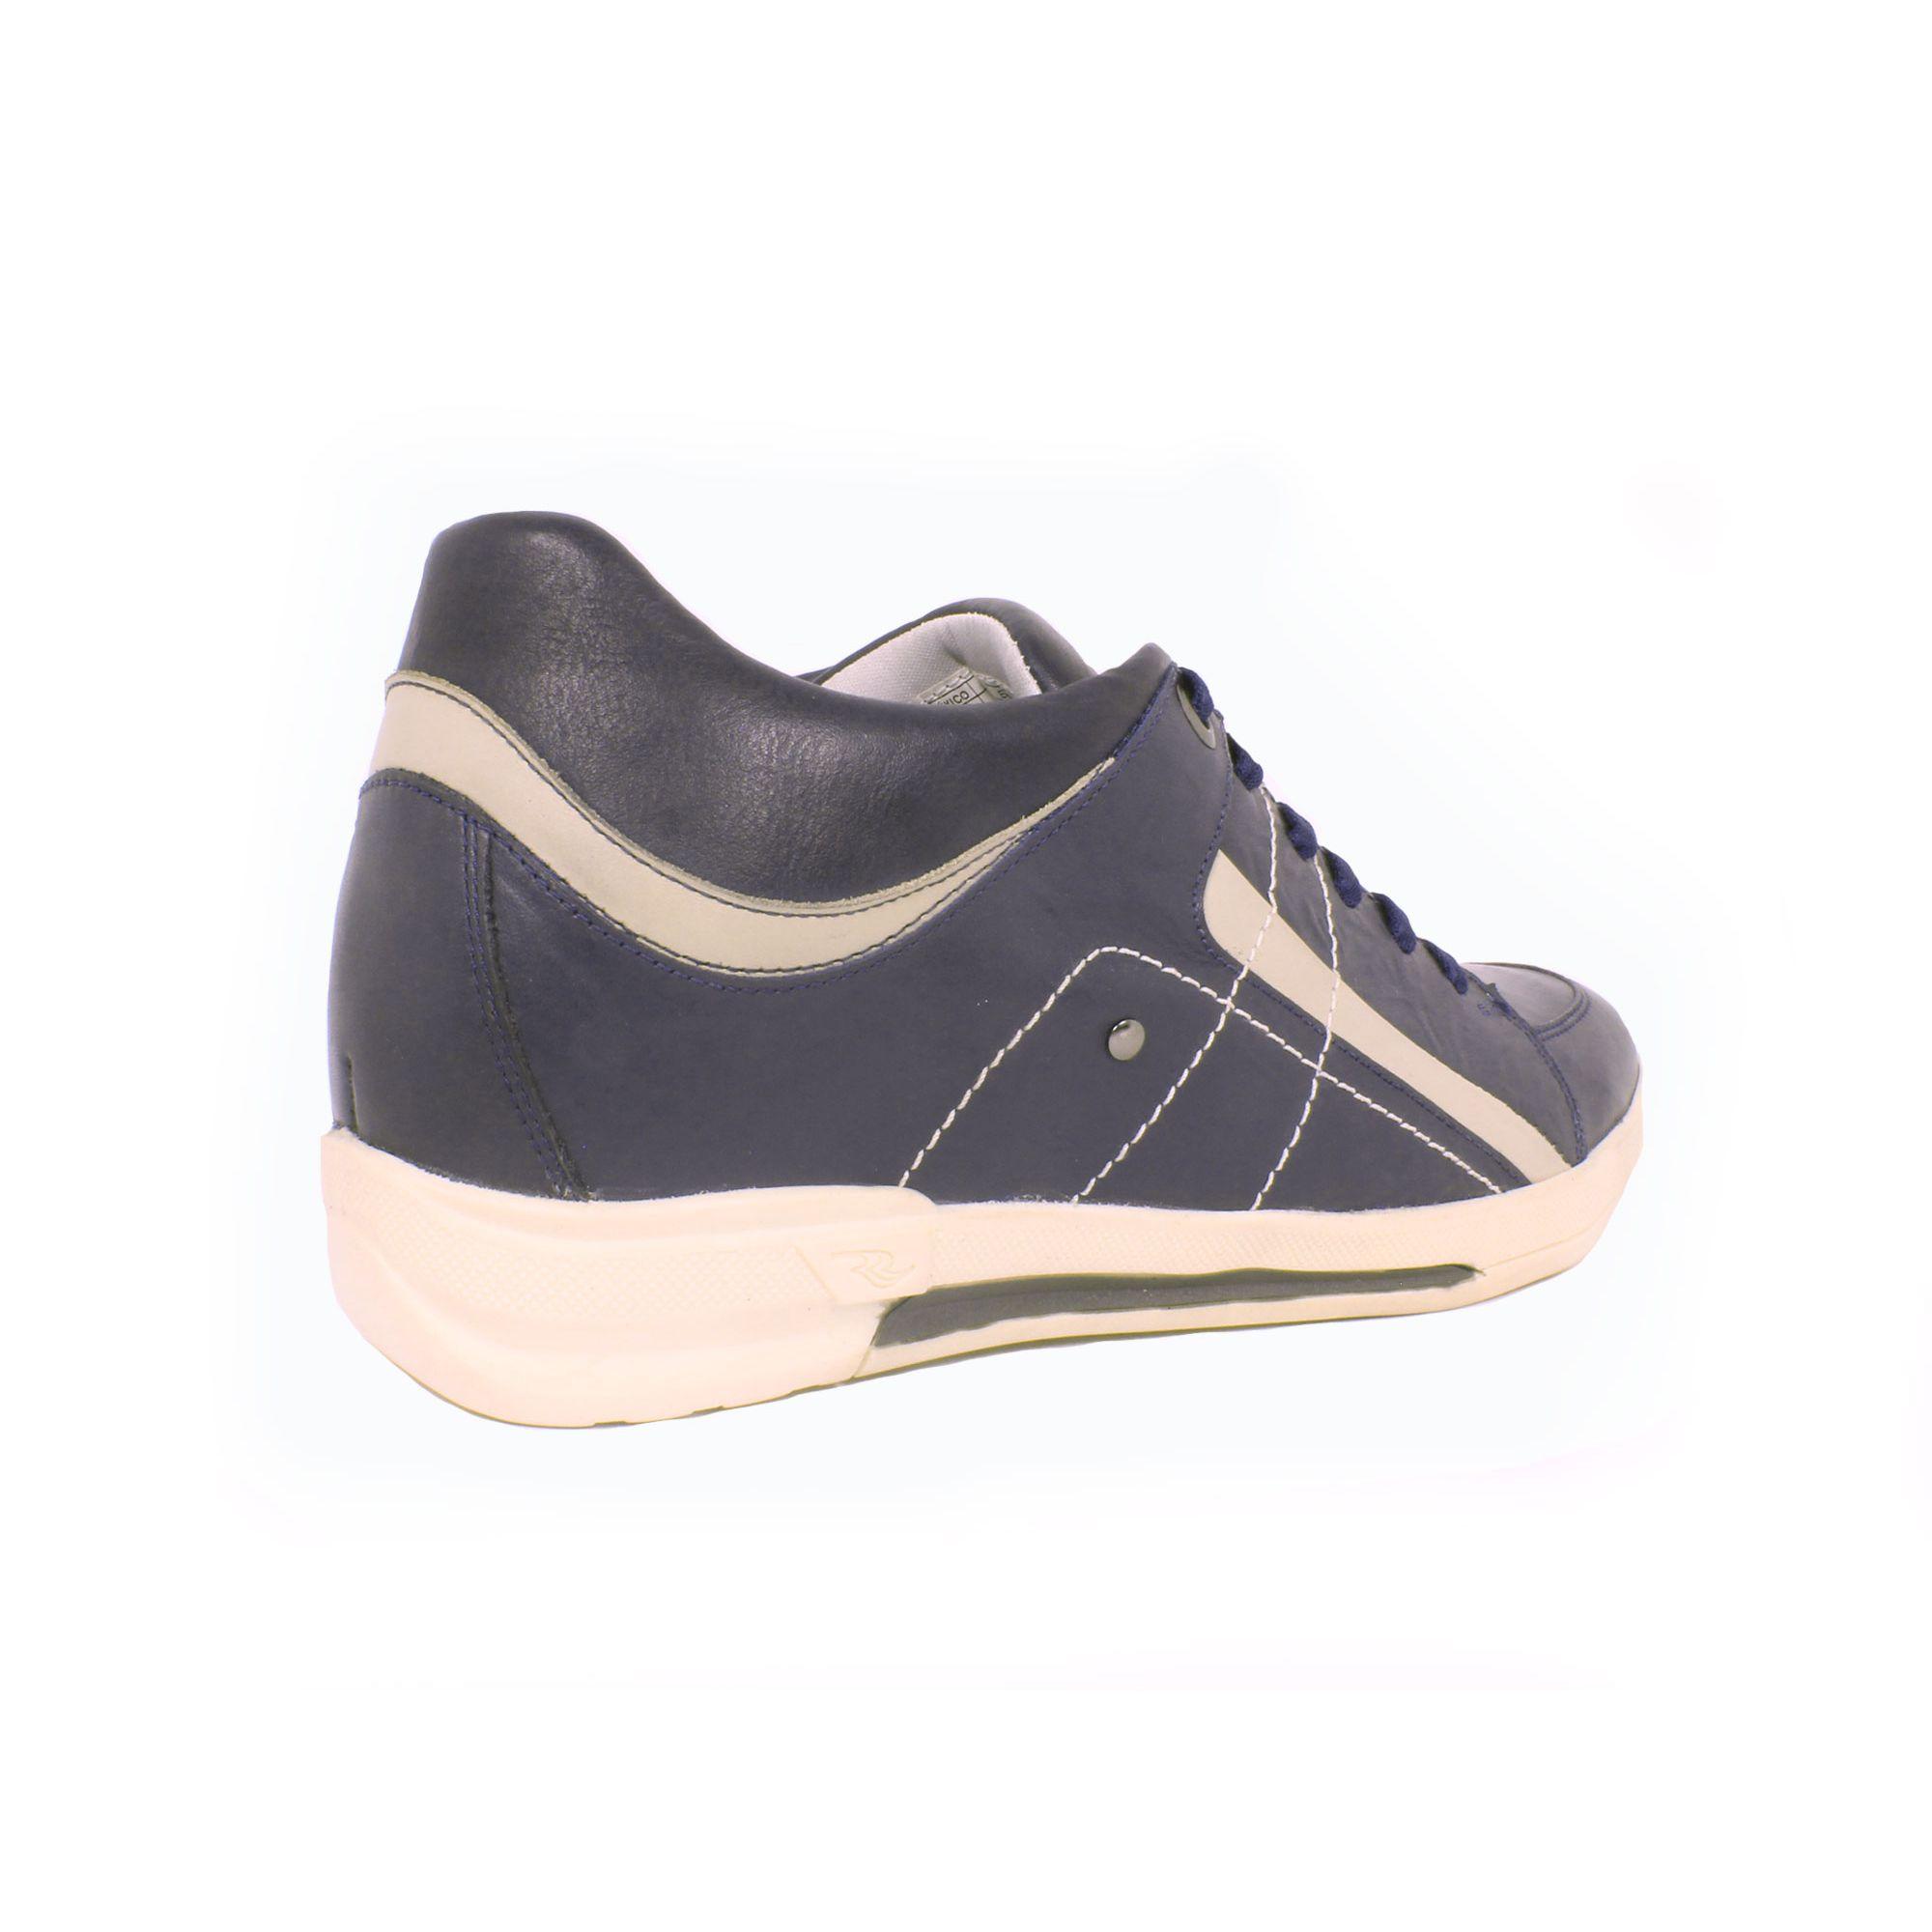 Zapato Casual Street Azul Max Denegri +7cm de Altura_70933